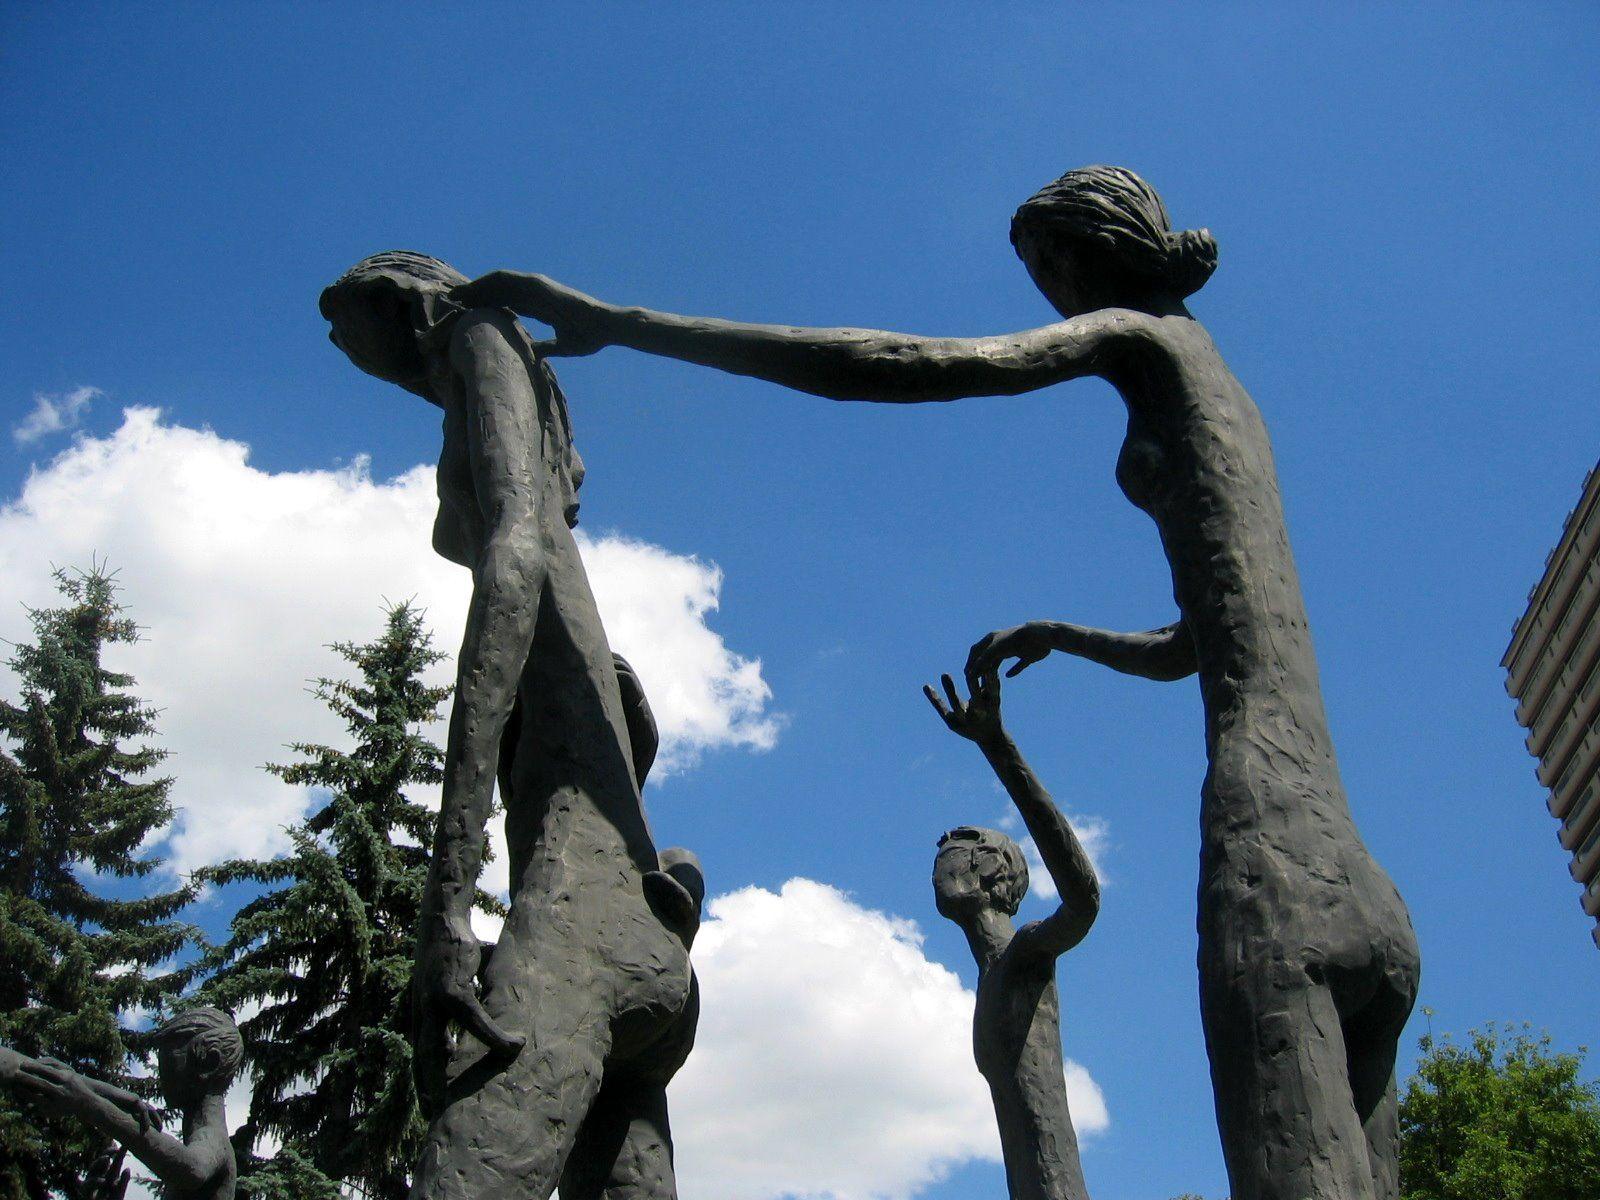 armature sculpture tutorial - Google Search   hypertufa ahh & cement ...